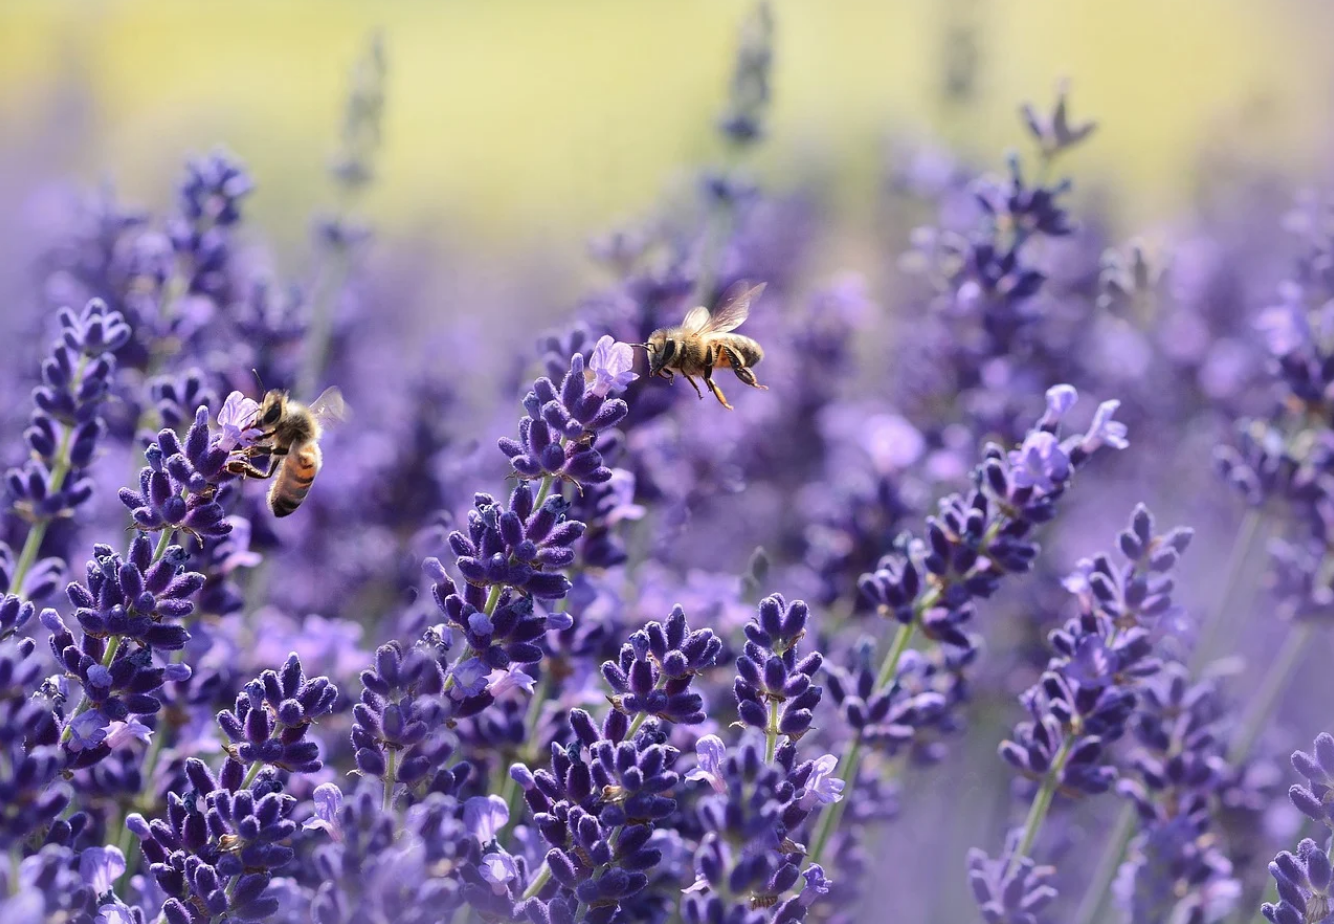 , Crean máscaras biodegradables que luego de su uso se convertirán en Flores para abejas